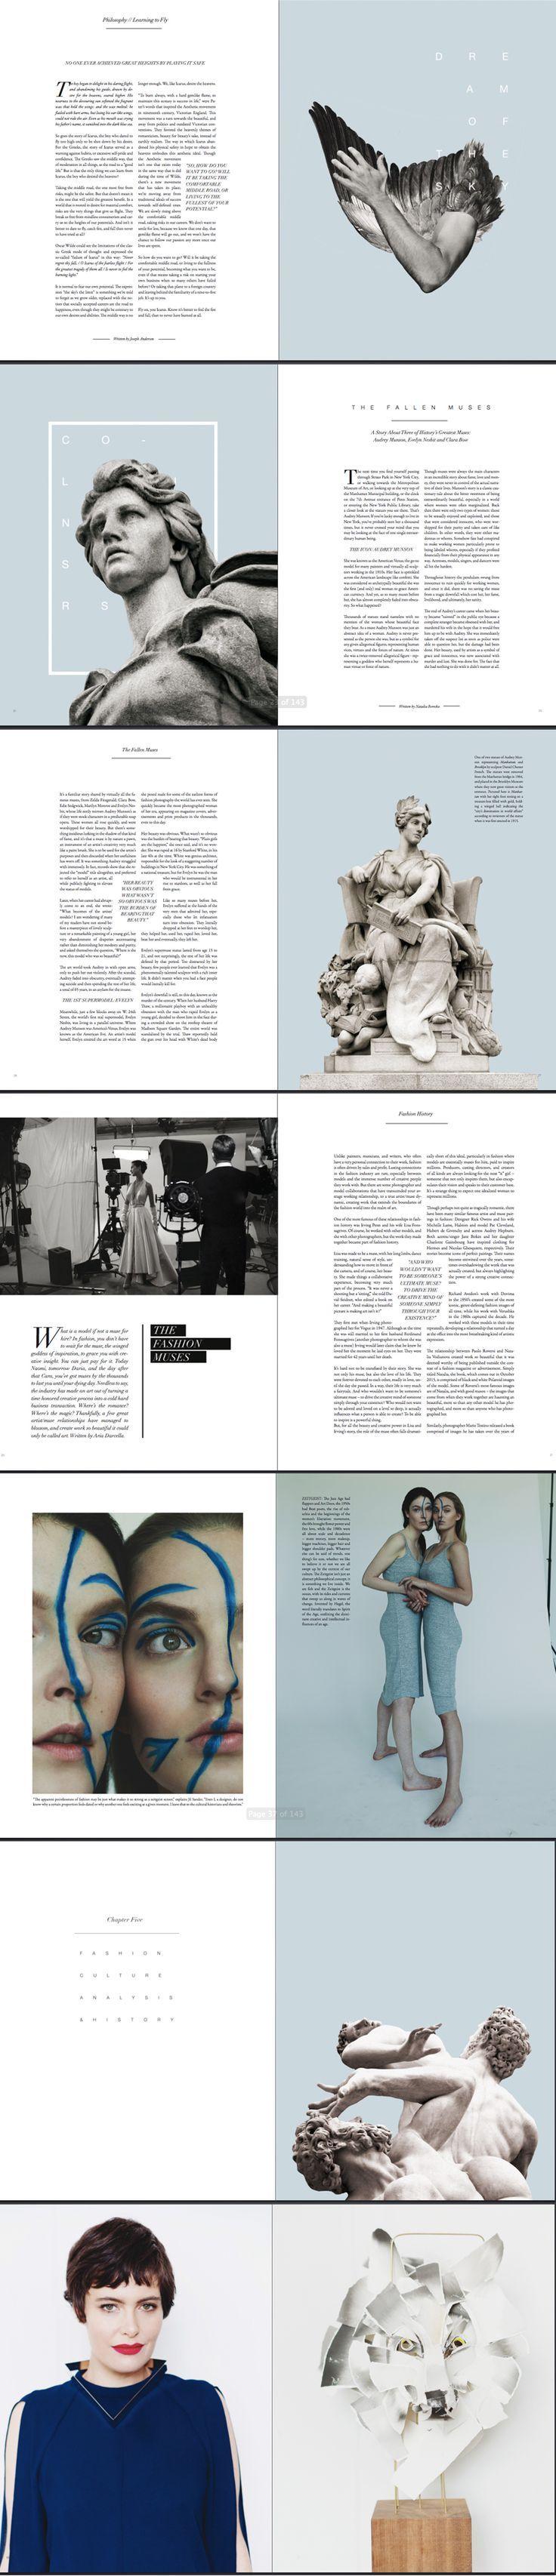 Lone Wolf Magazine, Volume 12 Layout Design | Graphic Design | Magazine Layout